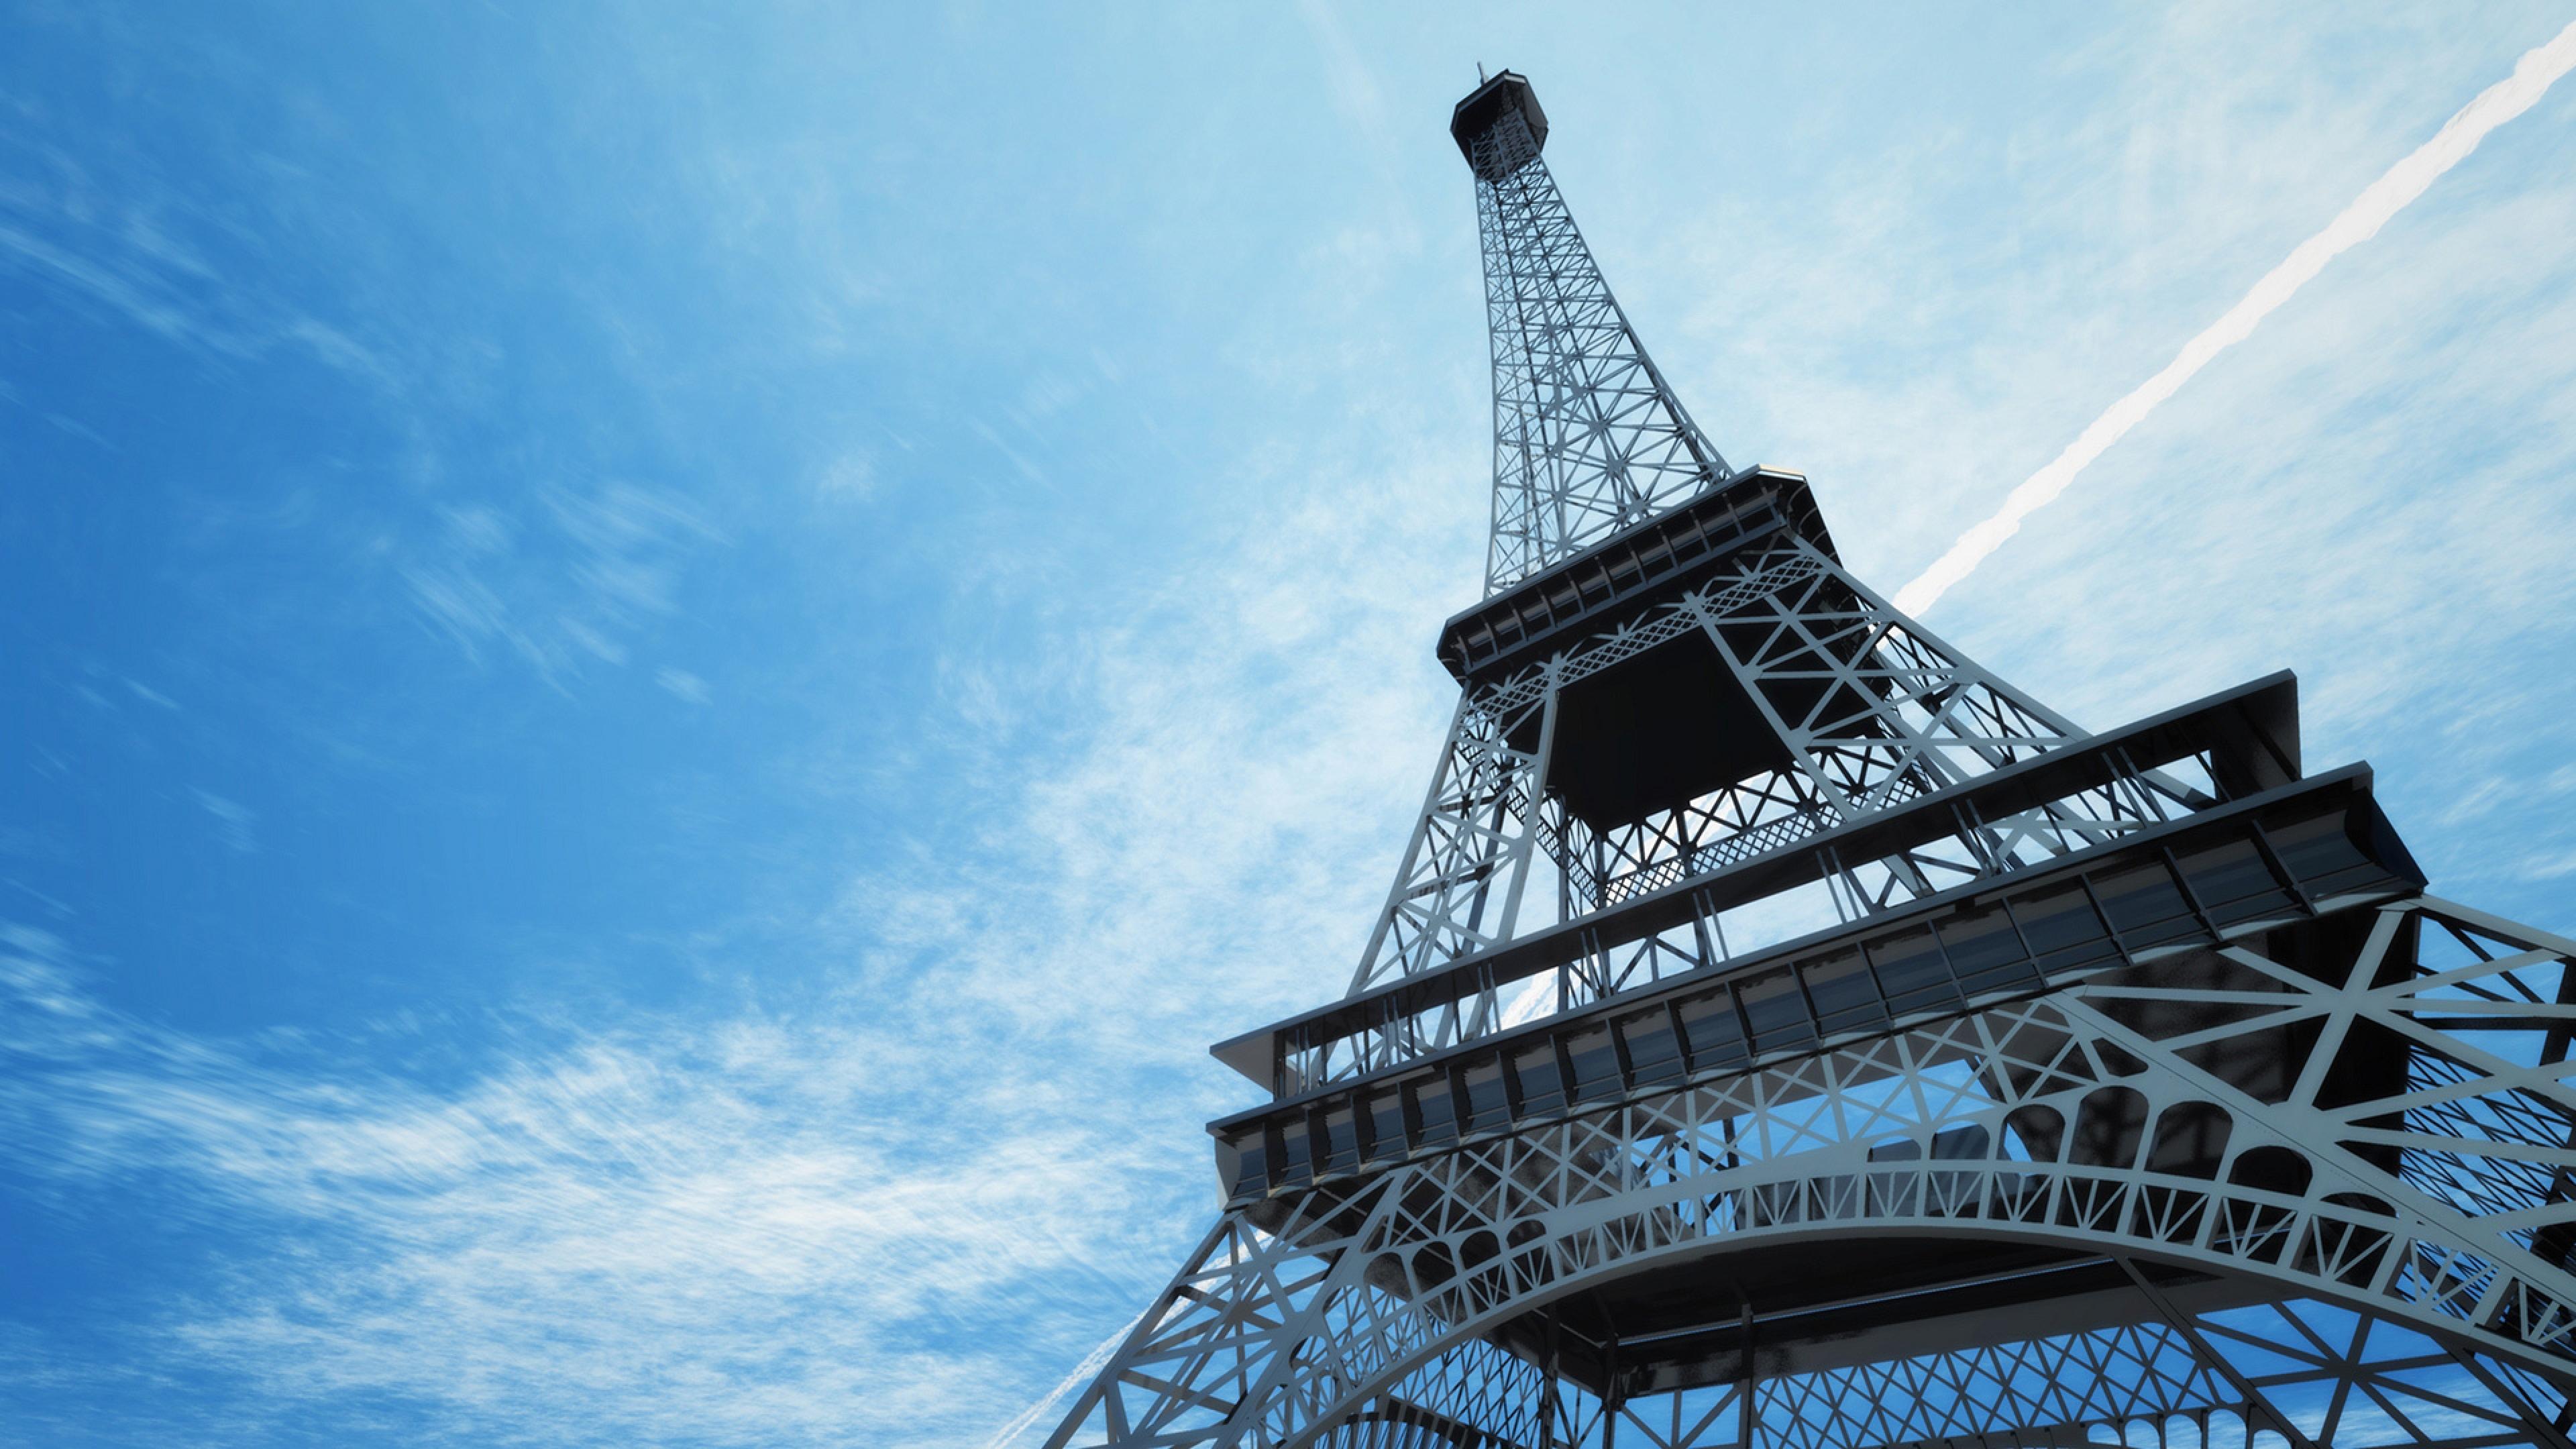 Free Download Paris France Eiffel Tower Skyline Wallpaper Background 4k Ultra Hd 3840x2160 For Your Desktop Mobile Tablet Explore 50 4k Nature Wallpaper Winter France 4k Hd Wallpaper Best